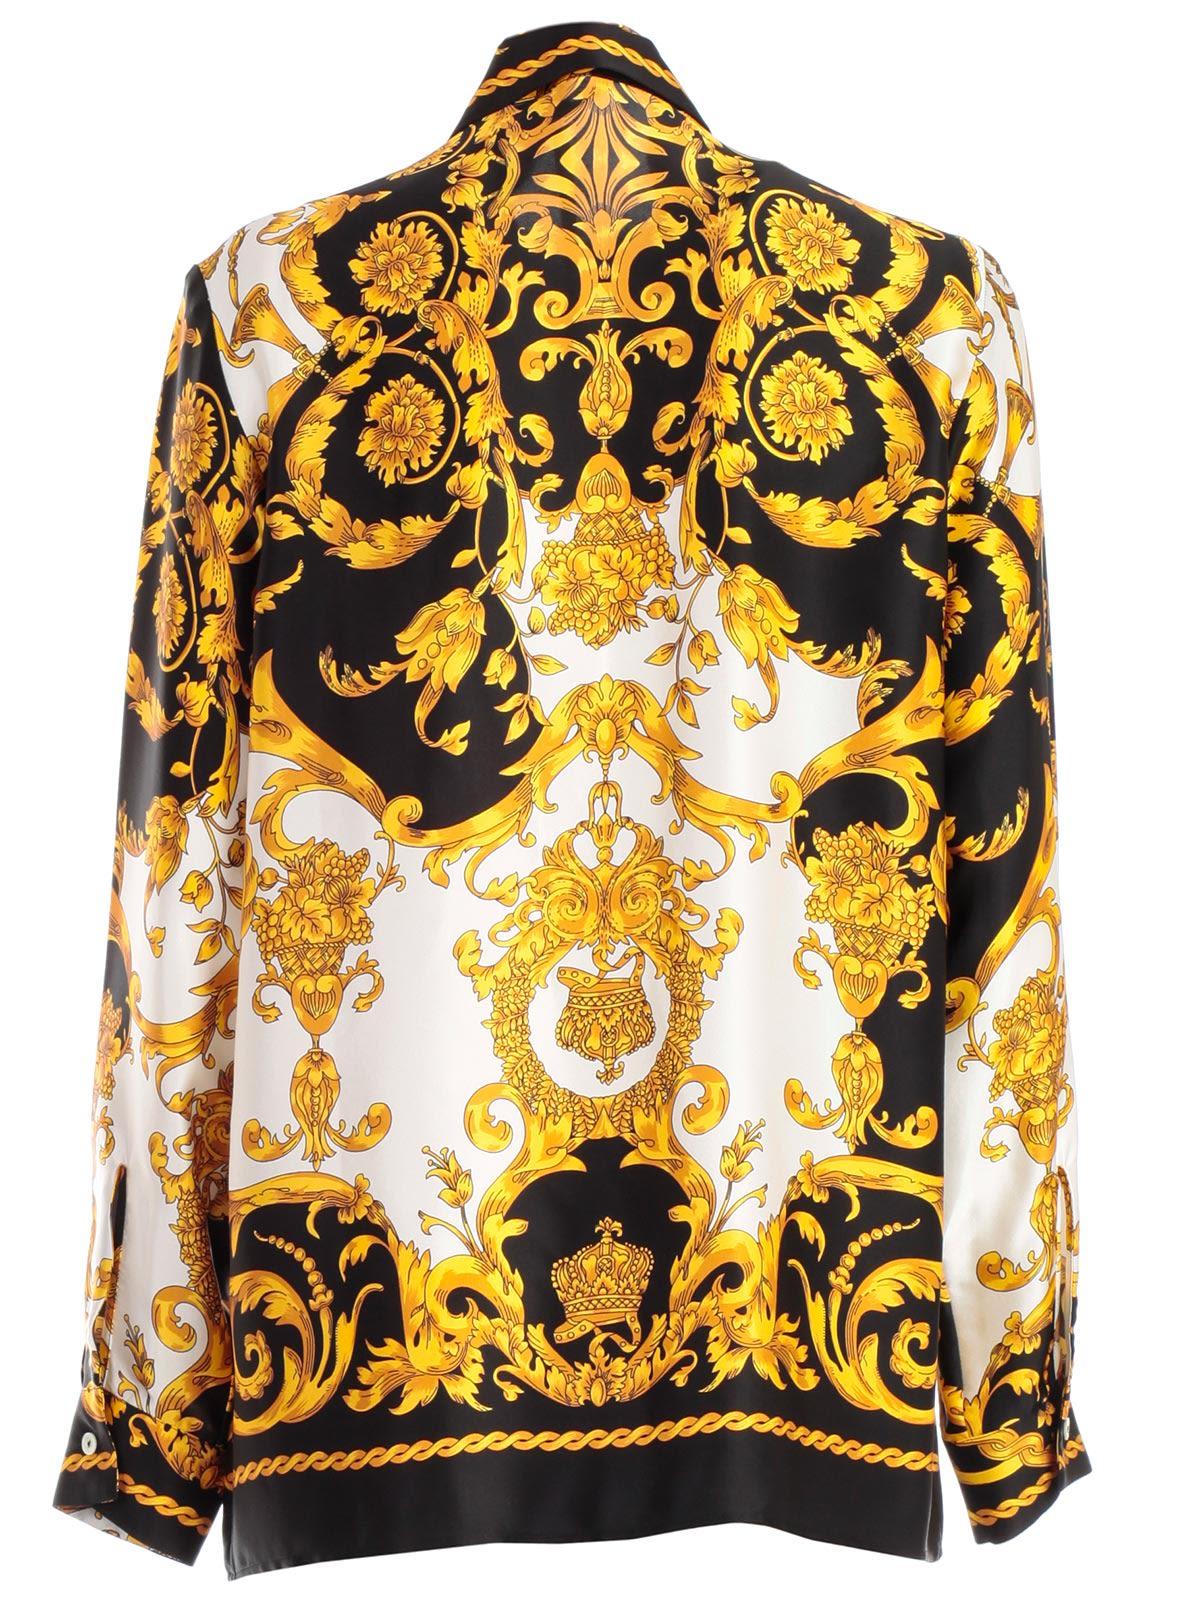 34c09340 Parosh Parosh Baroque Print Shirt - Fant Blk - 10774412   italist